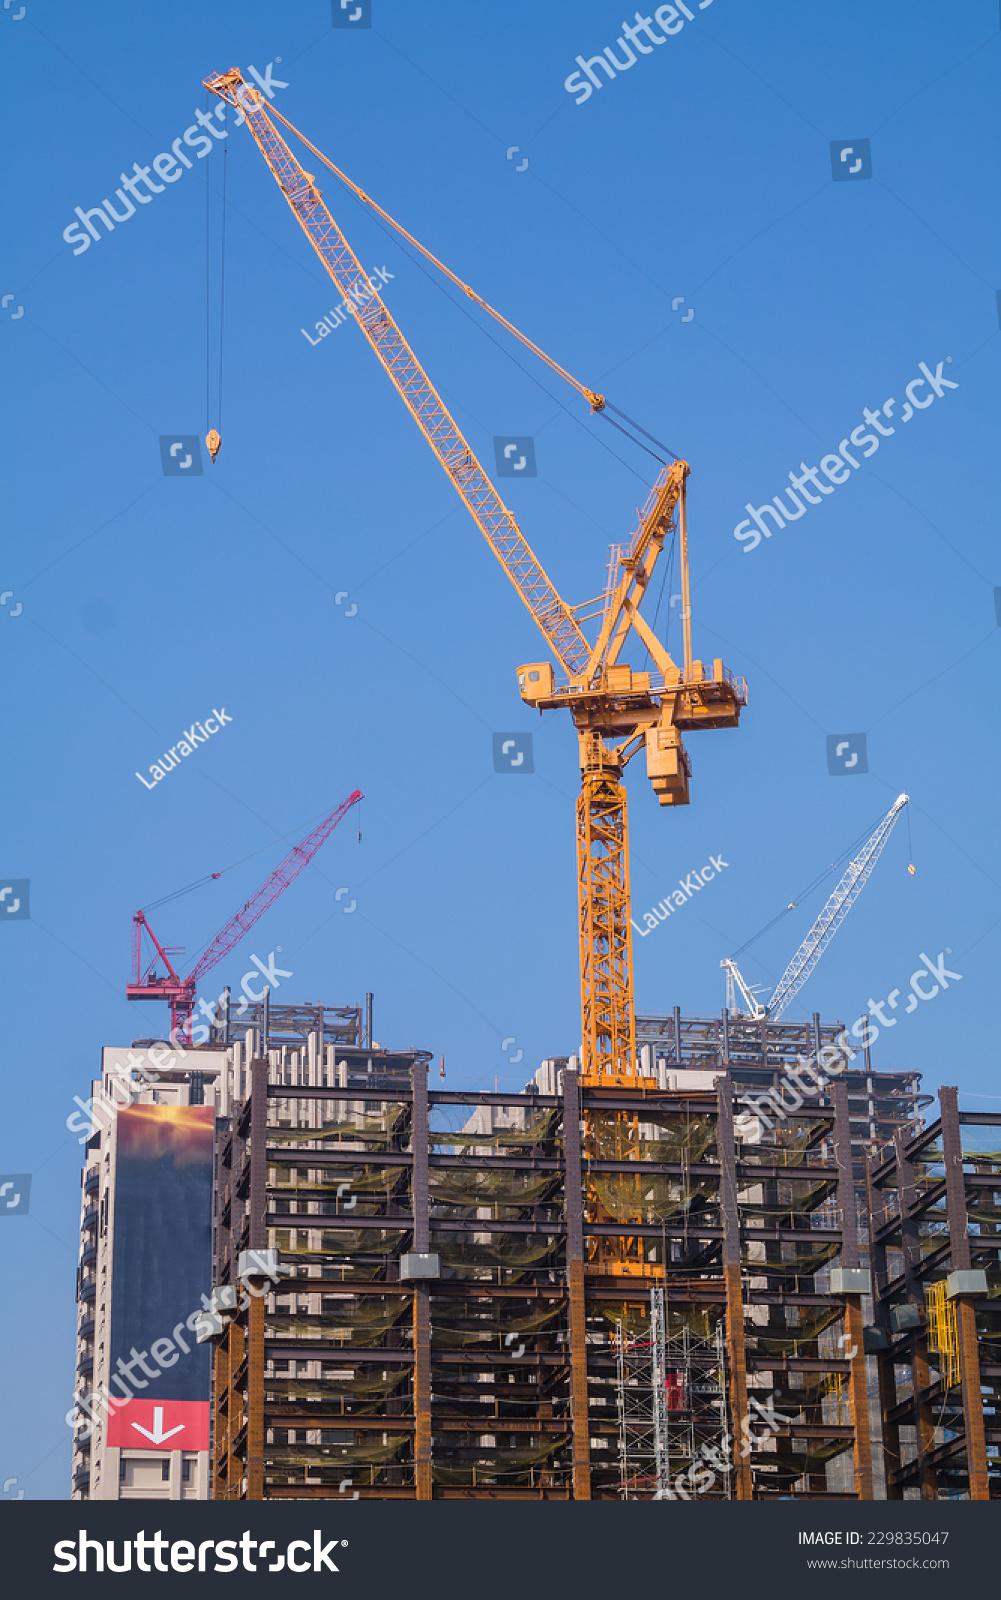 Yellow Tower Crane On Top Steel Stock Photo (Edit Now) 229835047